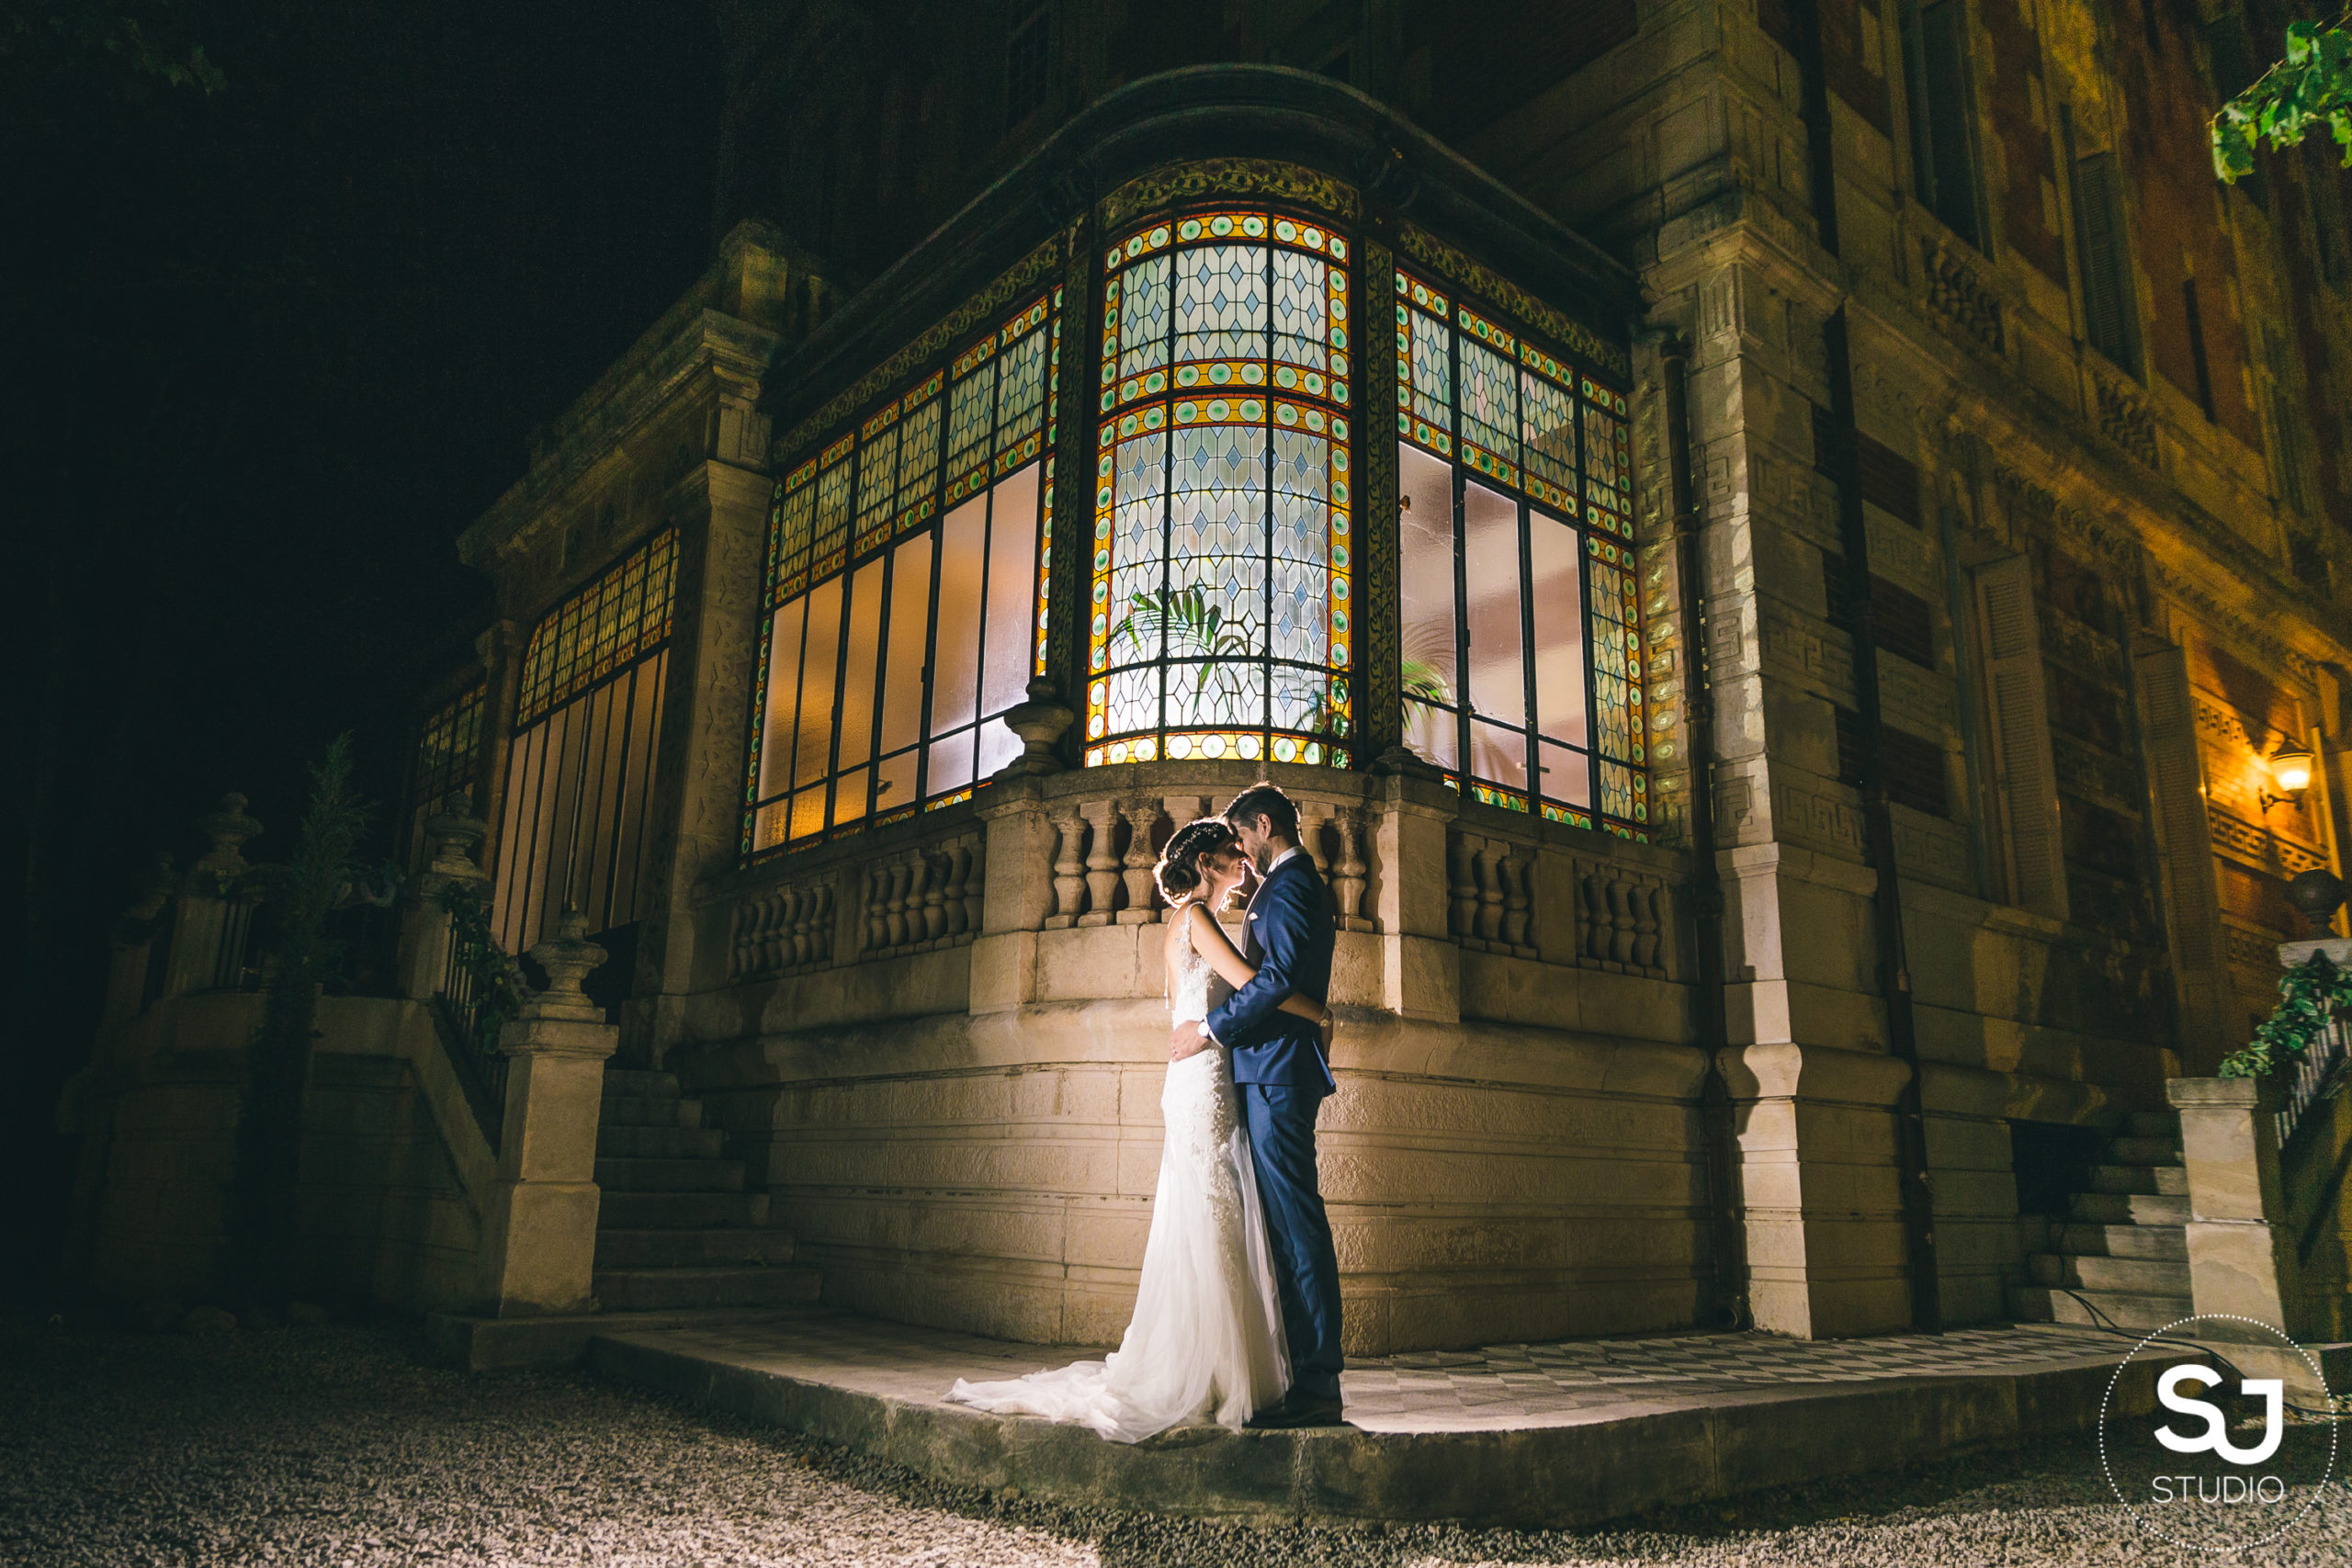 wedding-provence-south-france-bride-groom-chateau